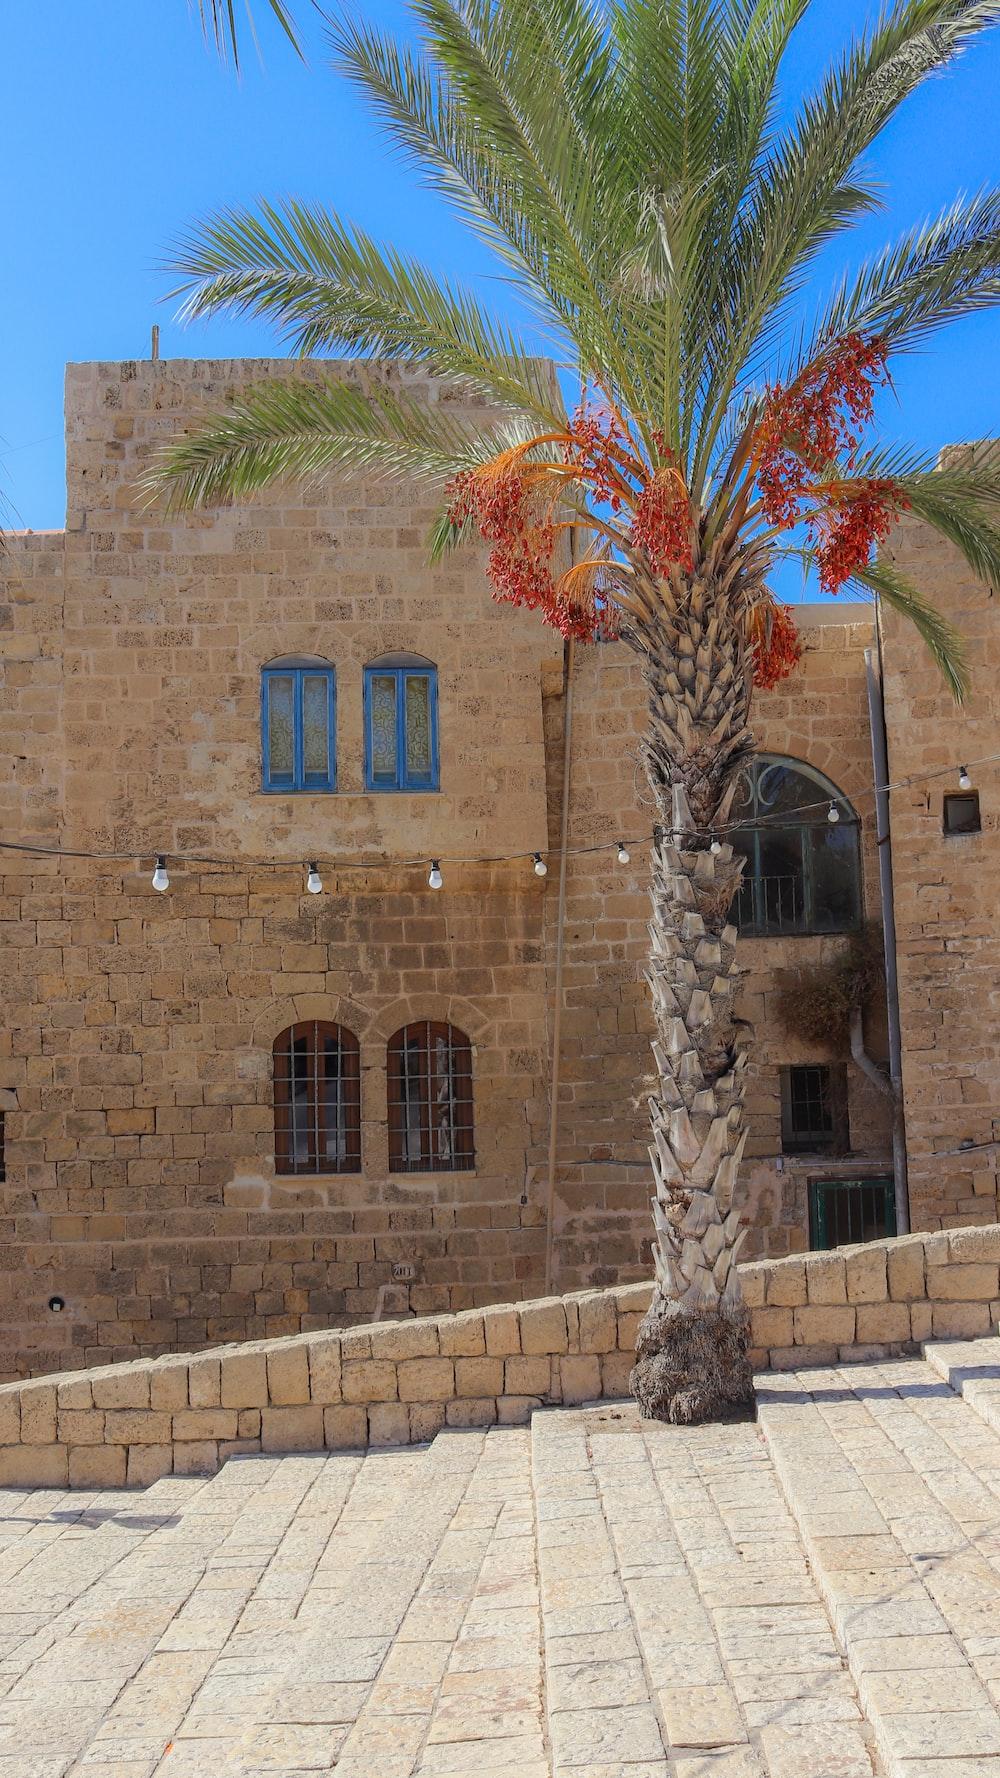 palm tree near brown concrete building